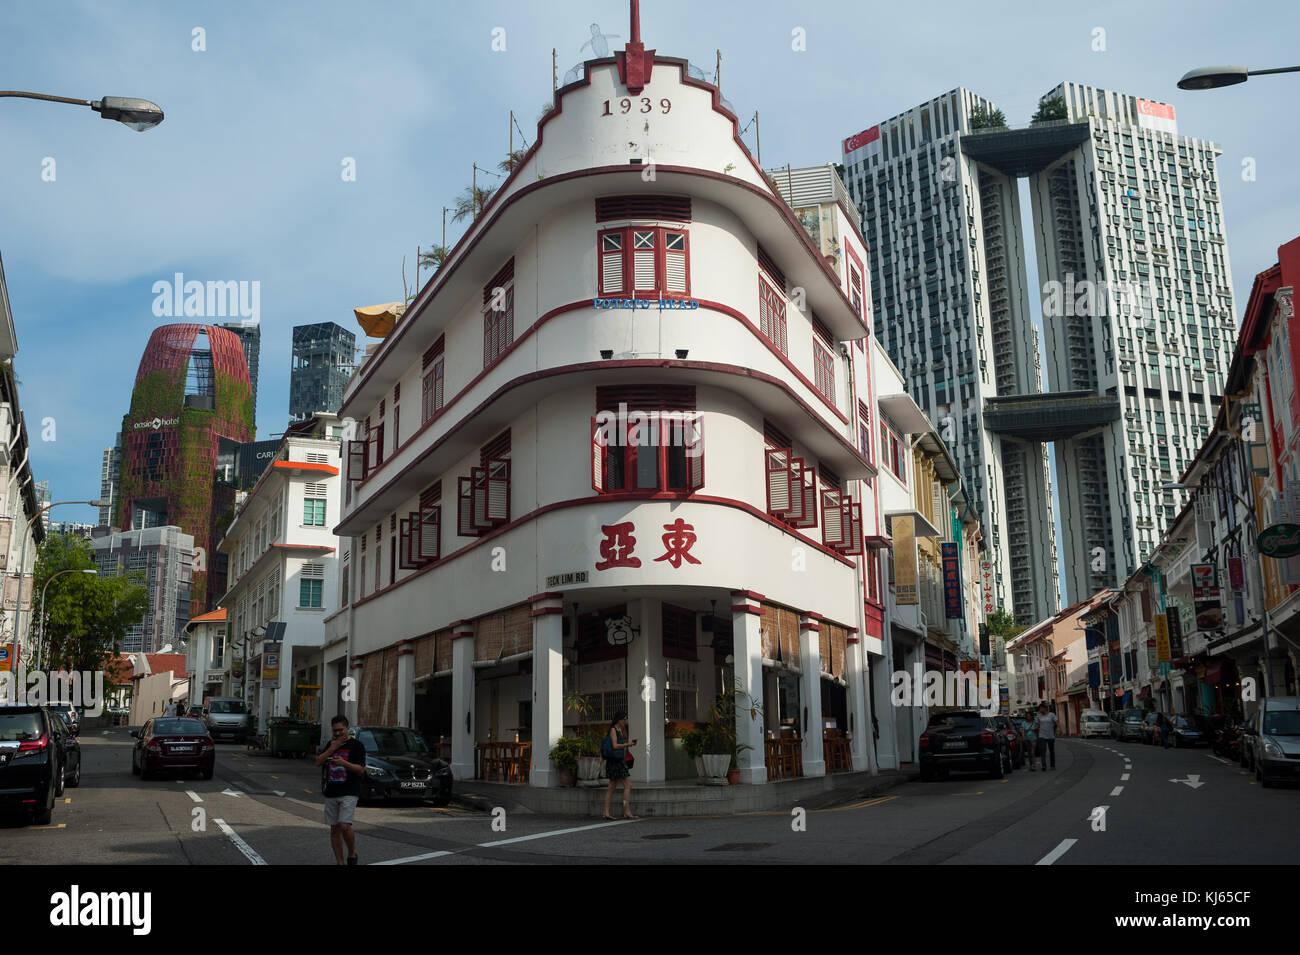 Hotels Republic Love Of Singapore In